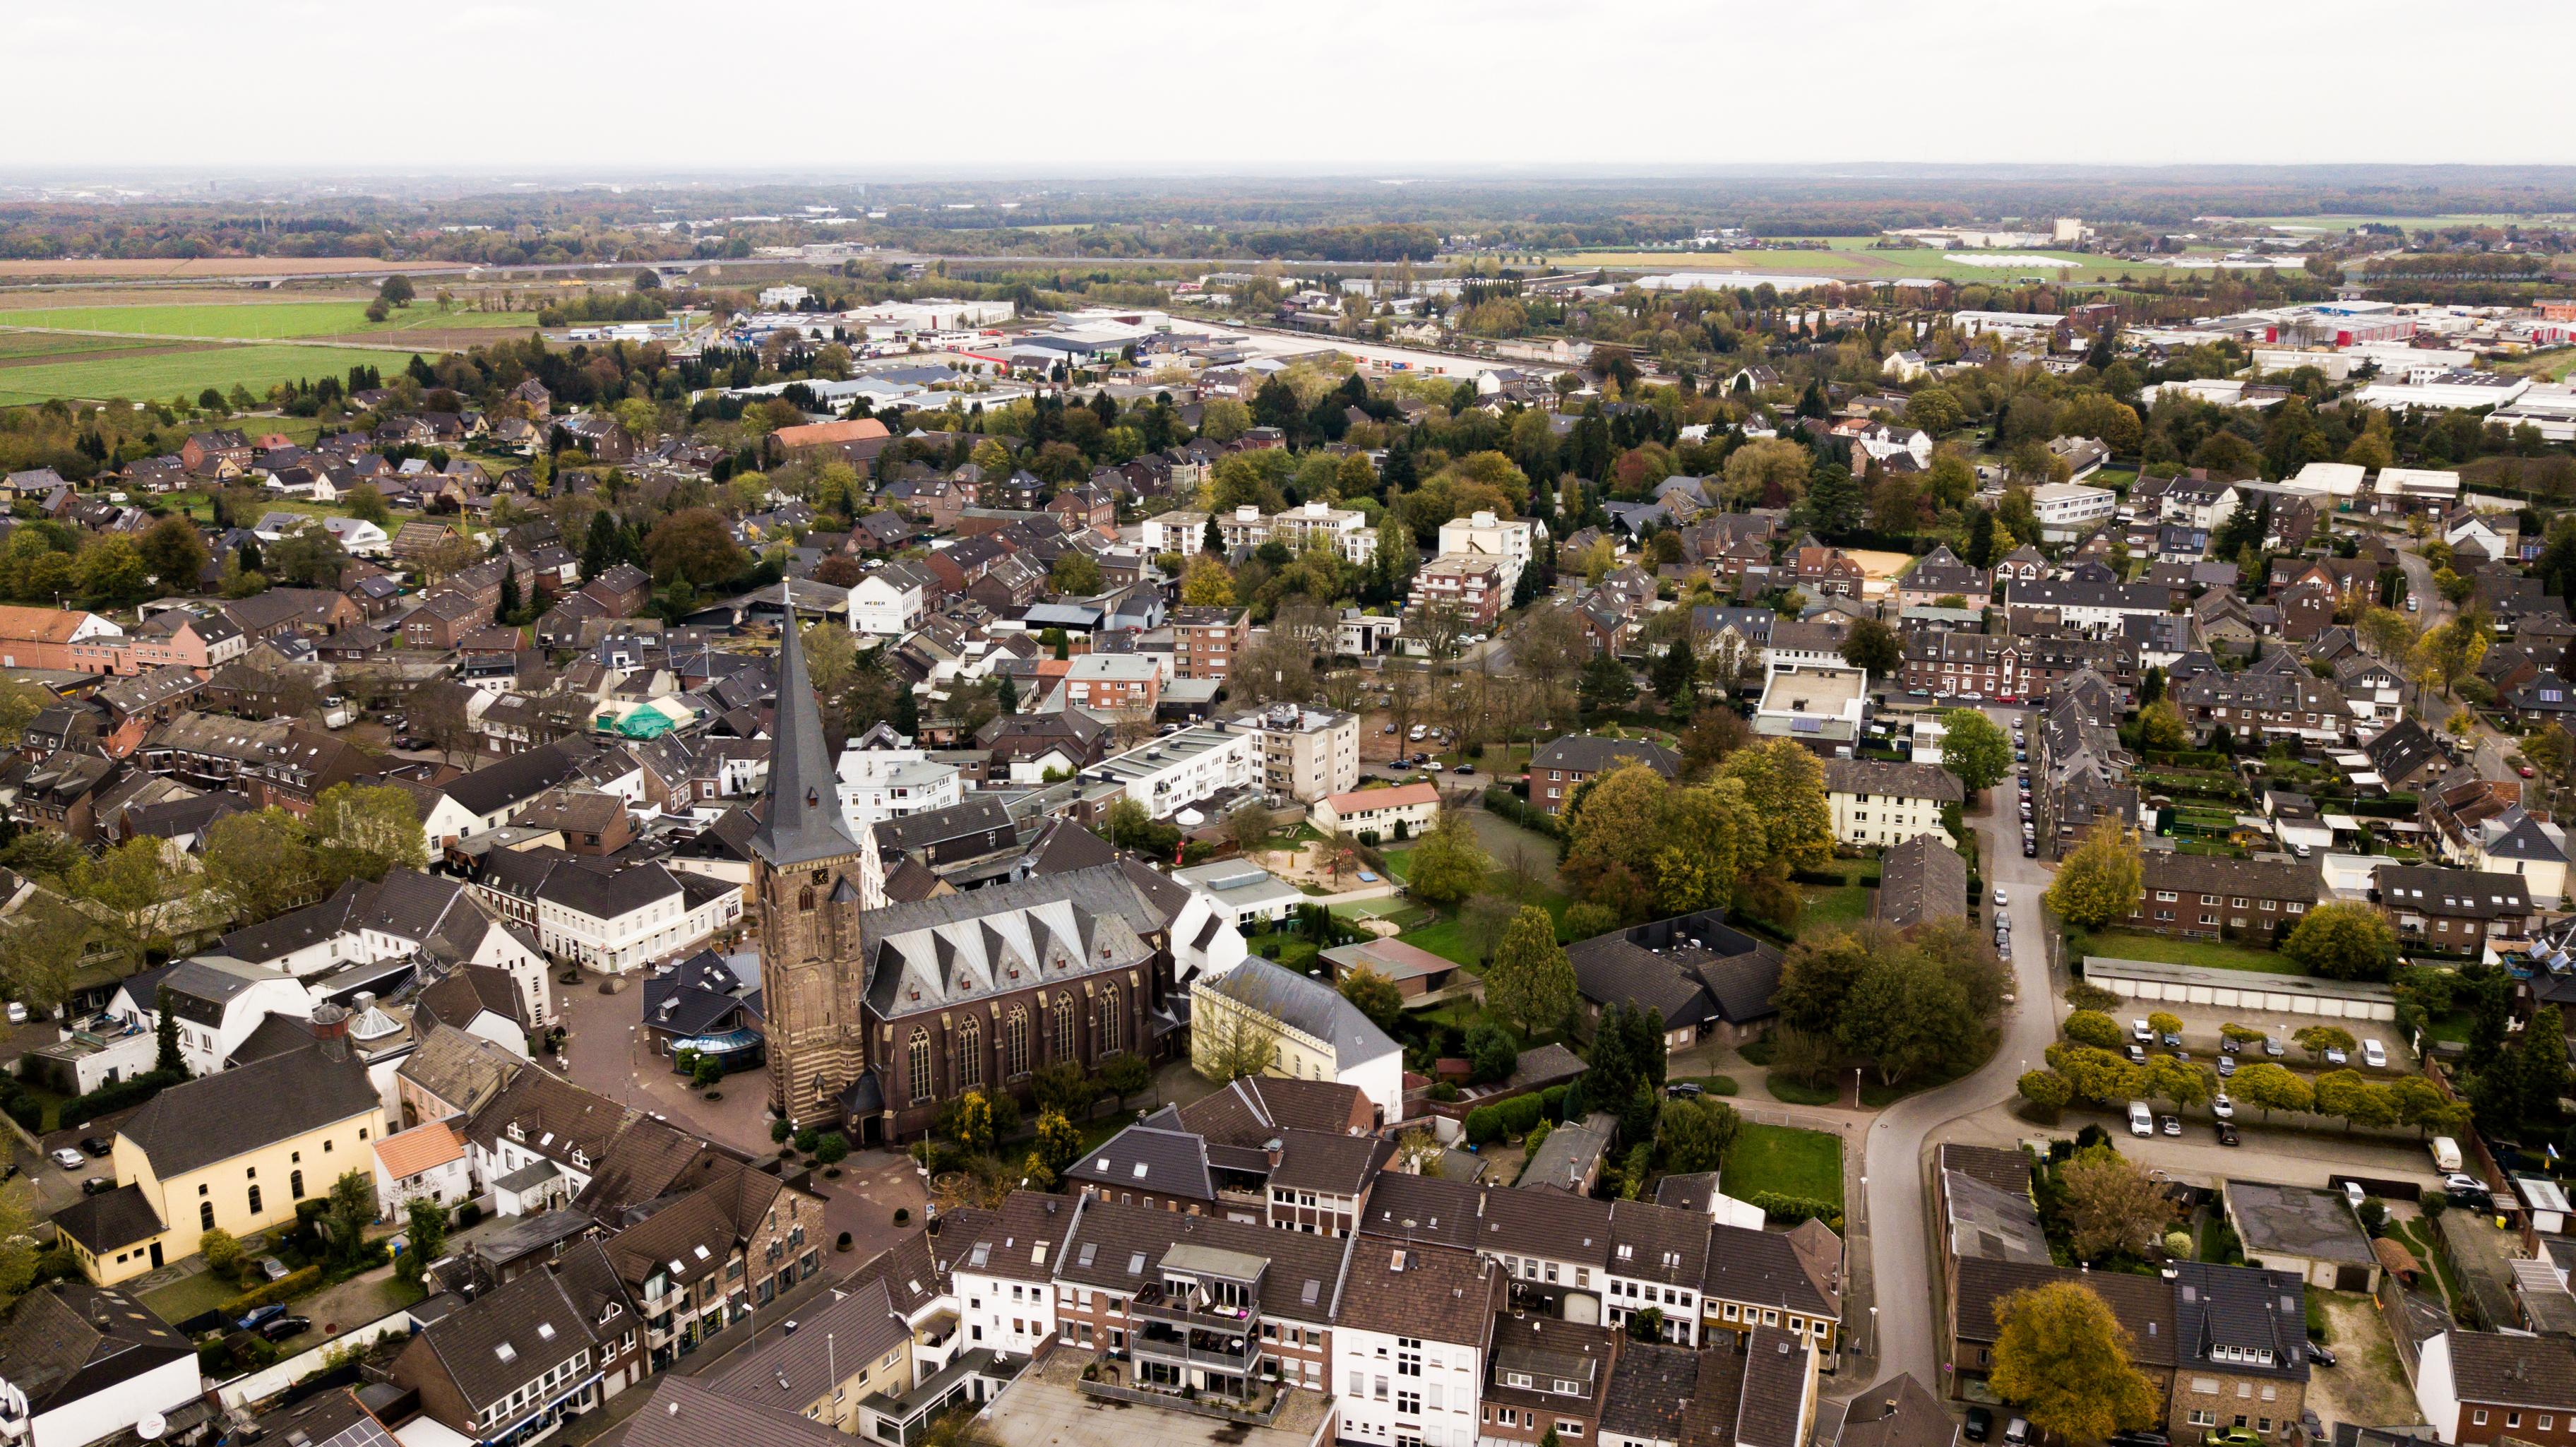 Kaldenkirchen - St. Klemens